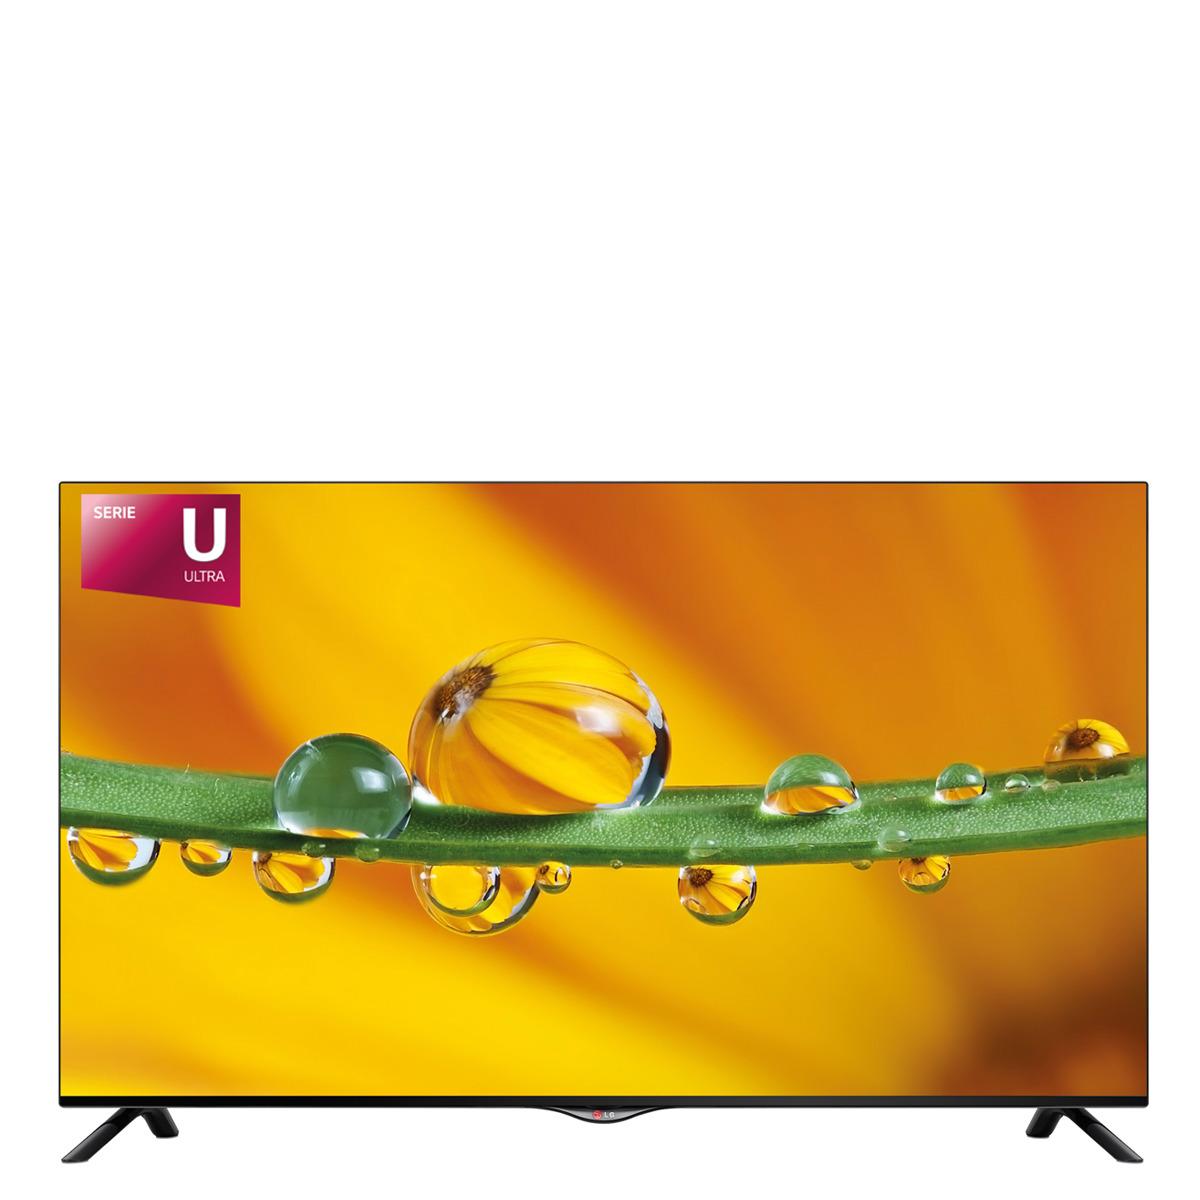 TV LED 42'' LG 42UB820V UHD 4K, 900 HZ UCI, Wi-Fi y Smart TV